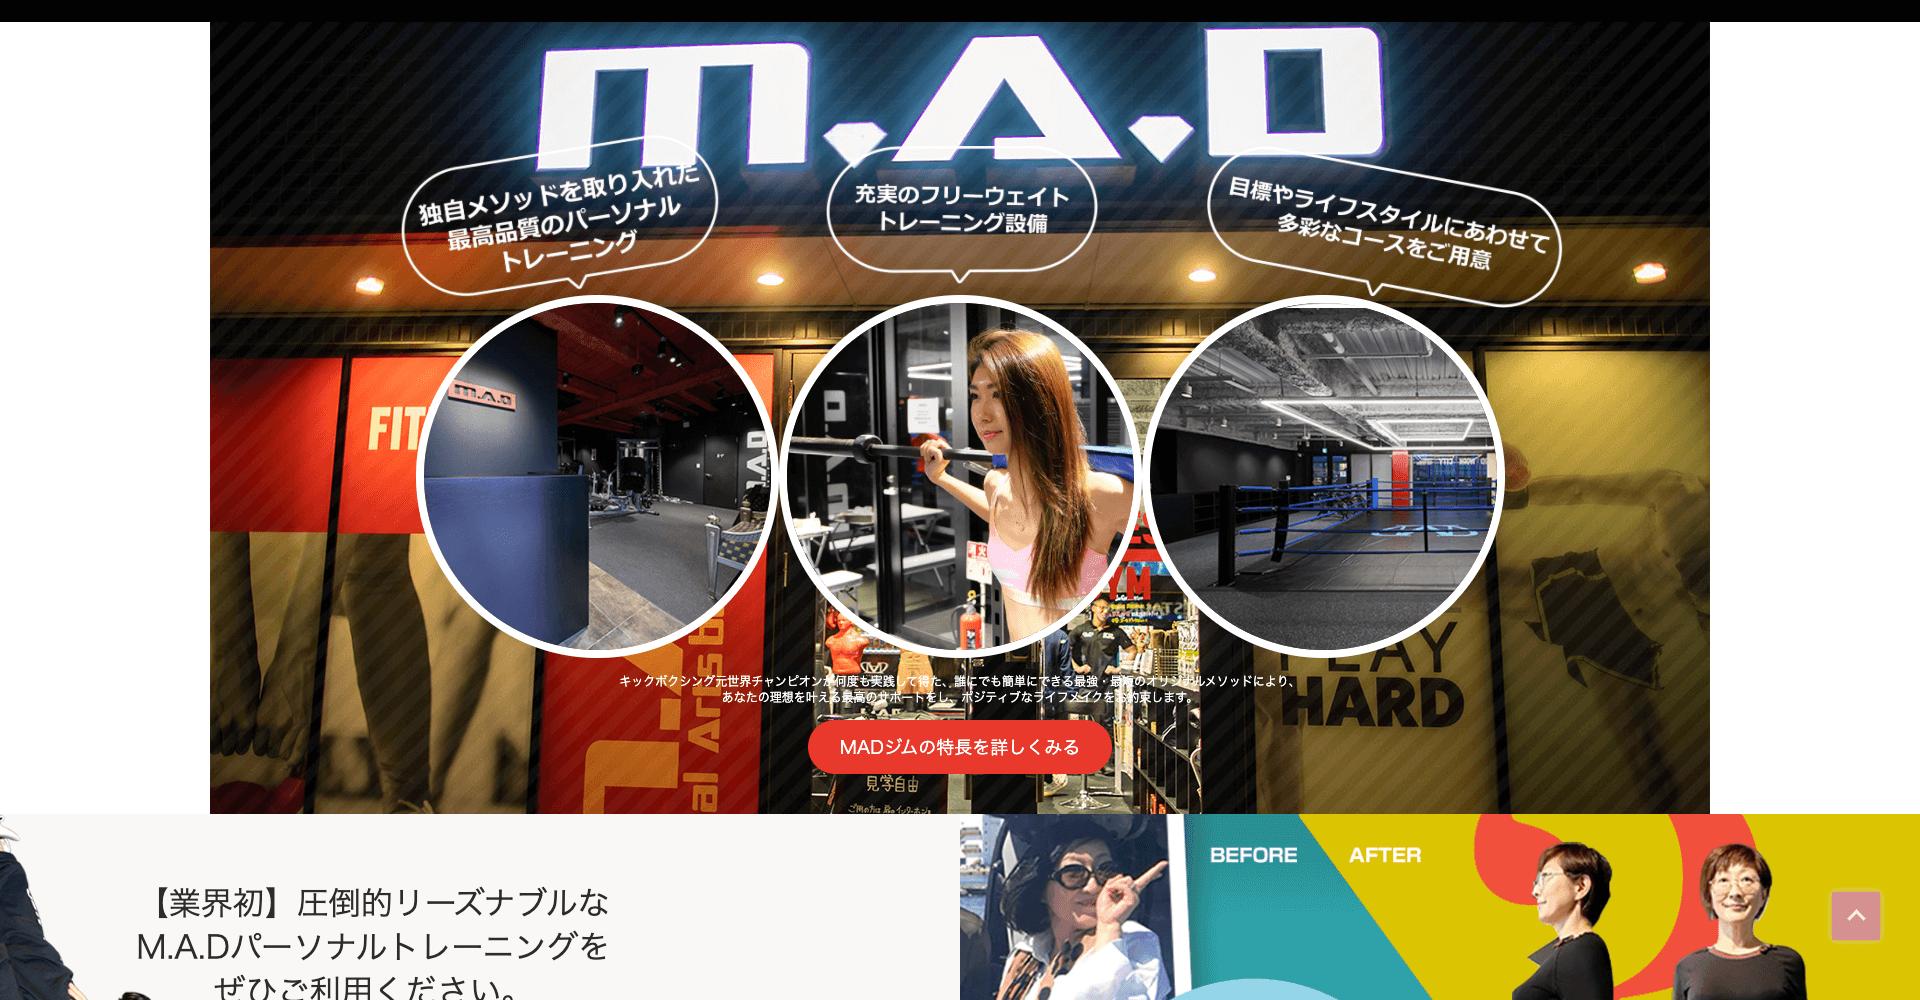 M.A.D(エムエーディー)